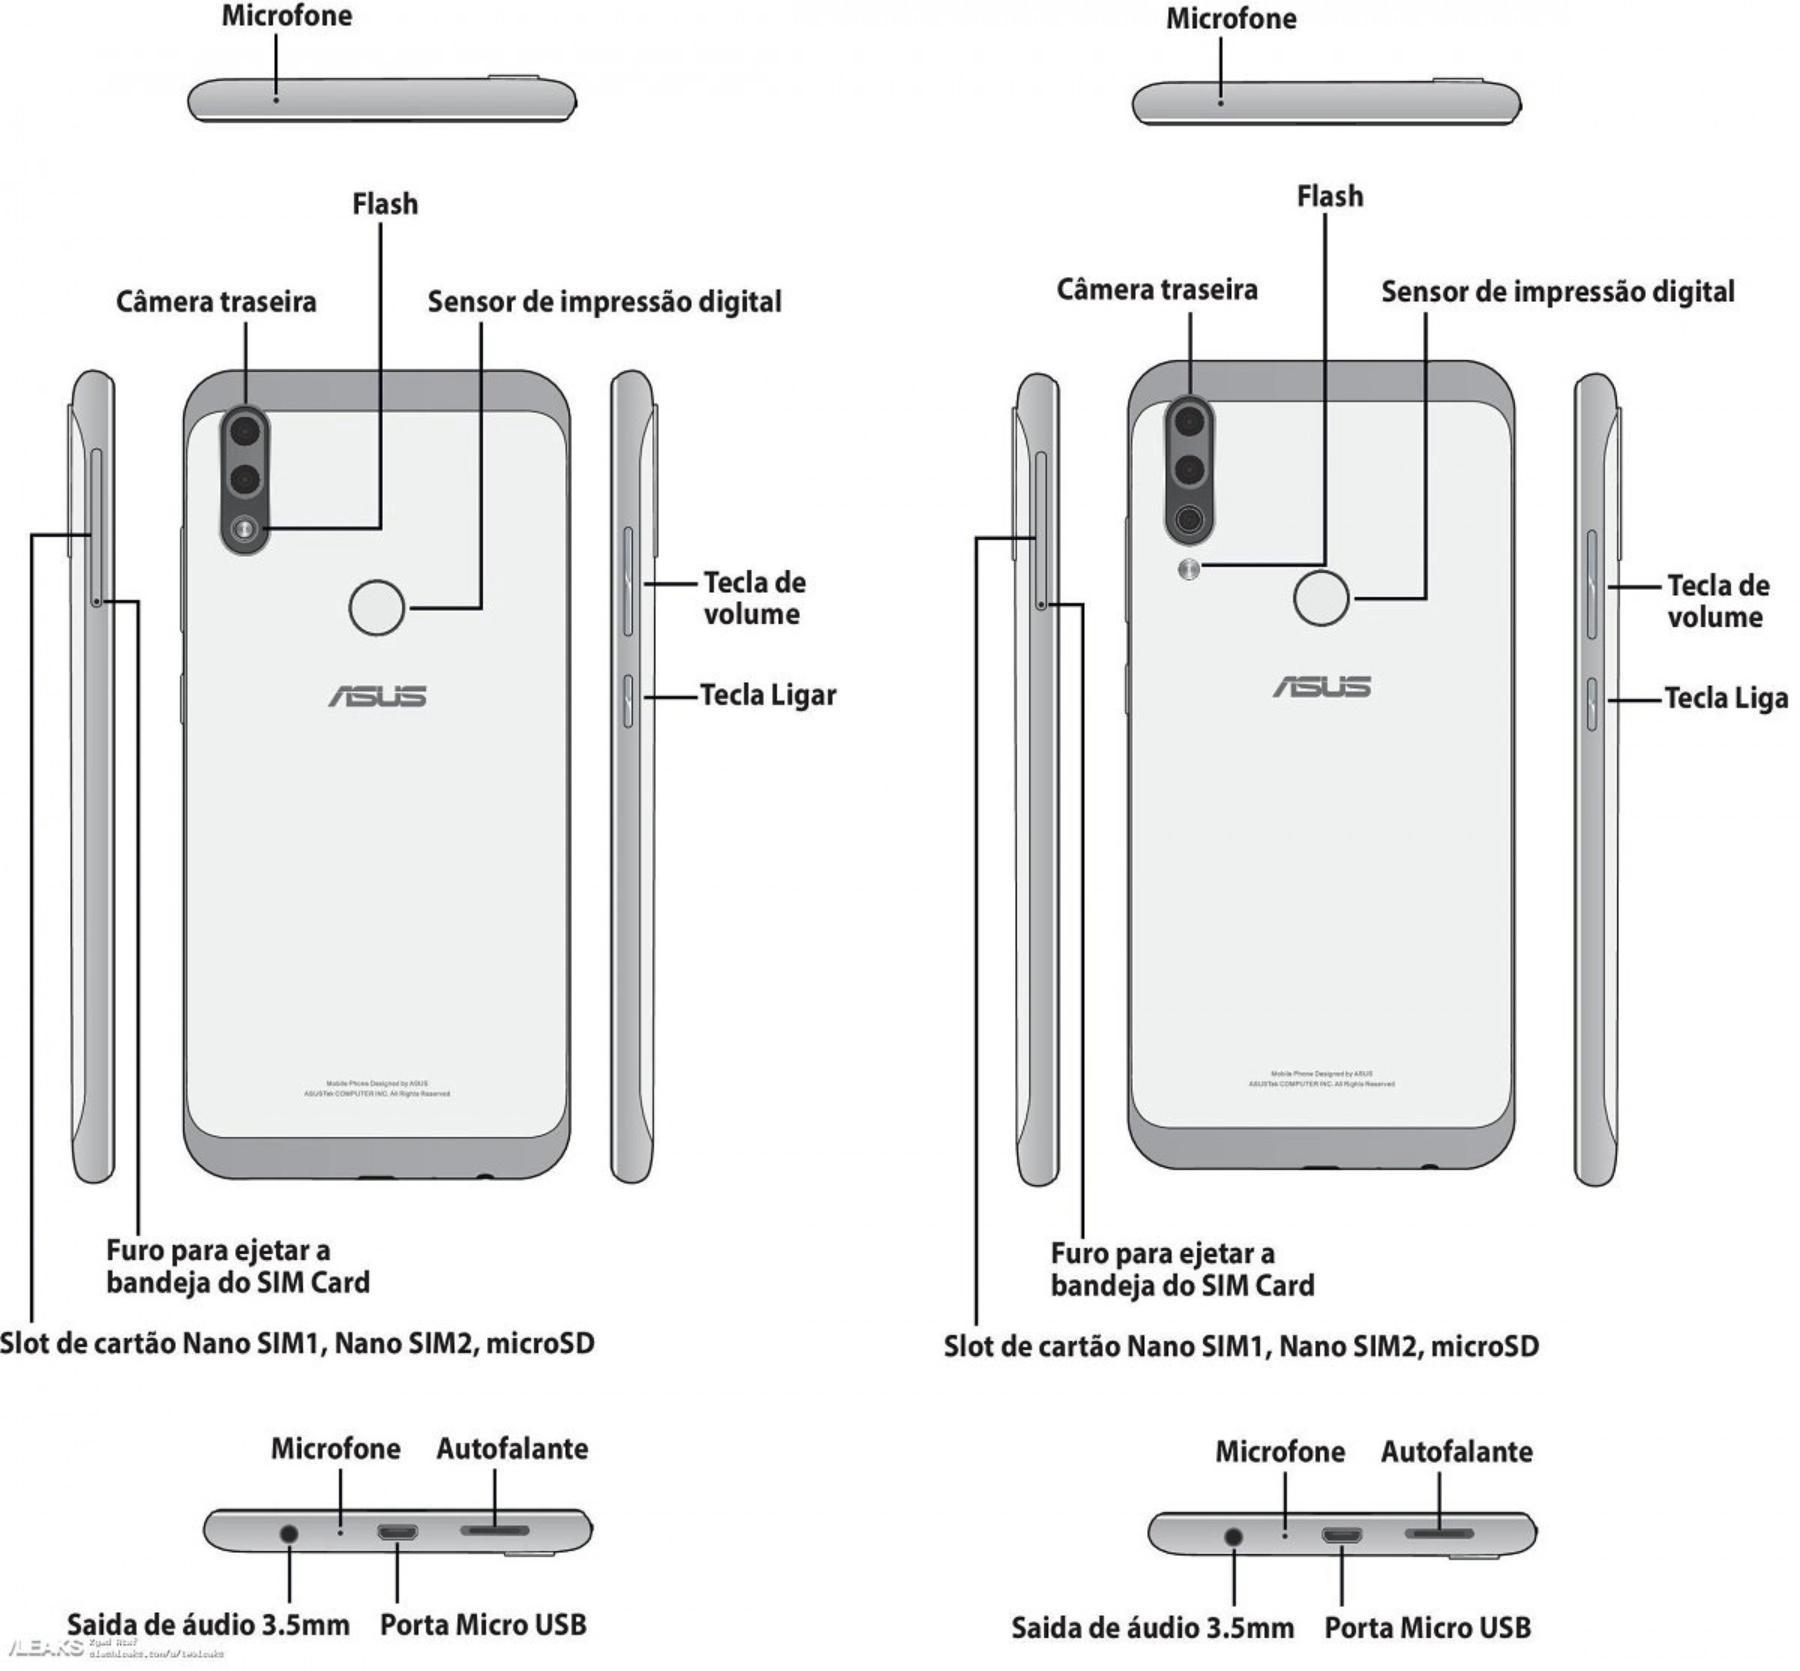 Asus готовит пару интригующих смартфонов: Zenfone Max Plus M2 иZenfone Max Shot